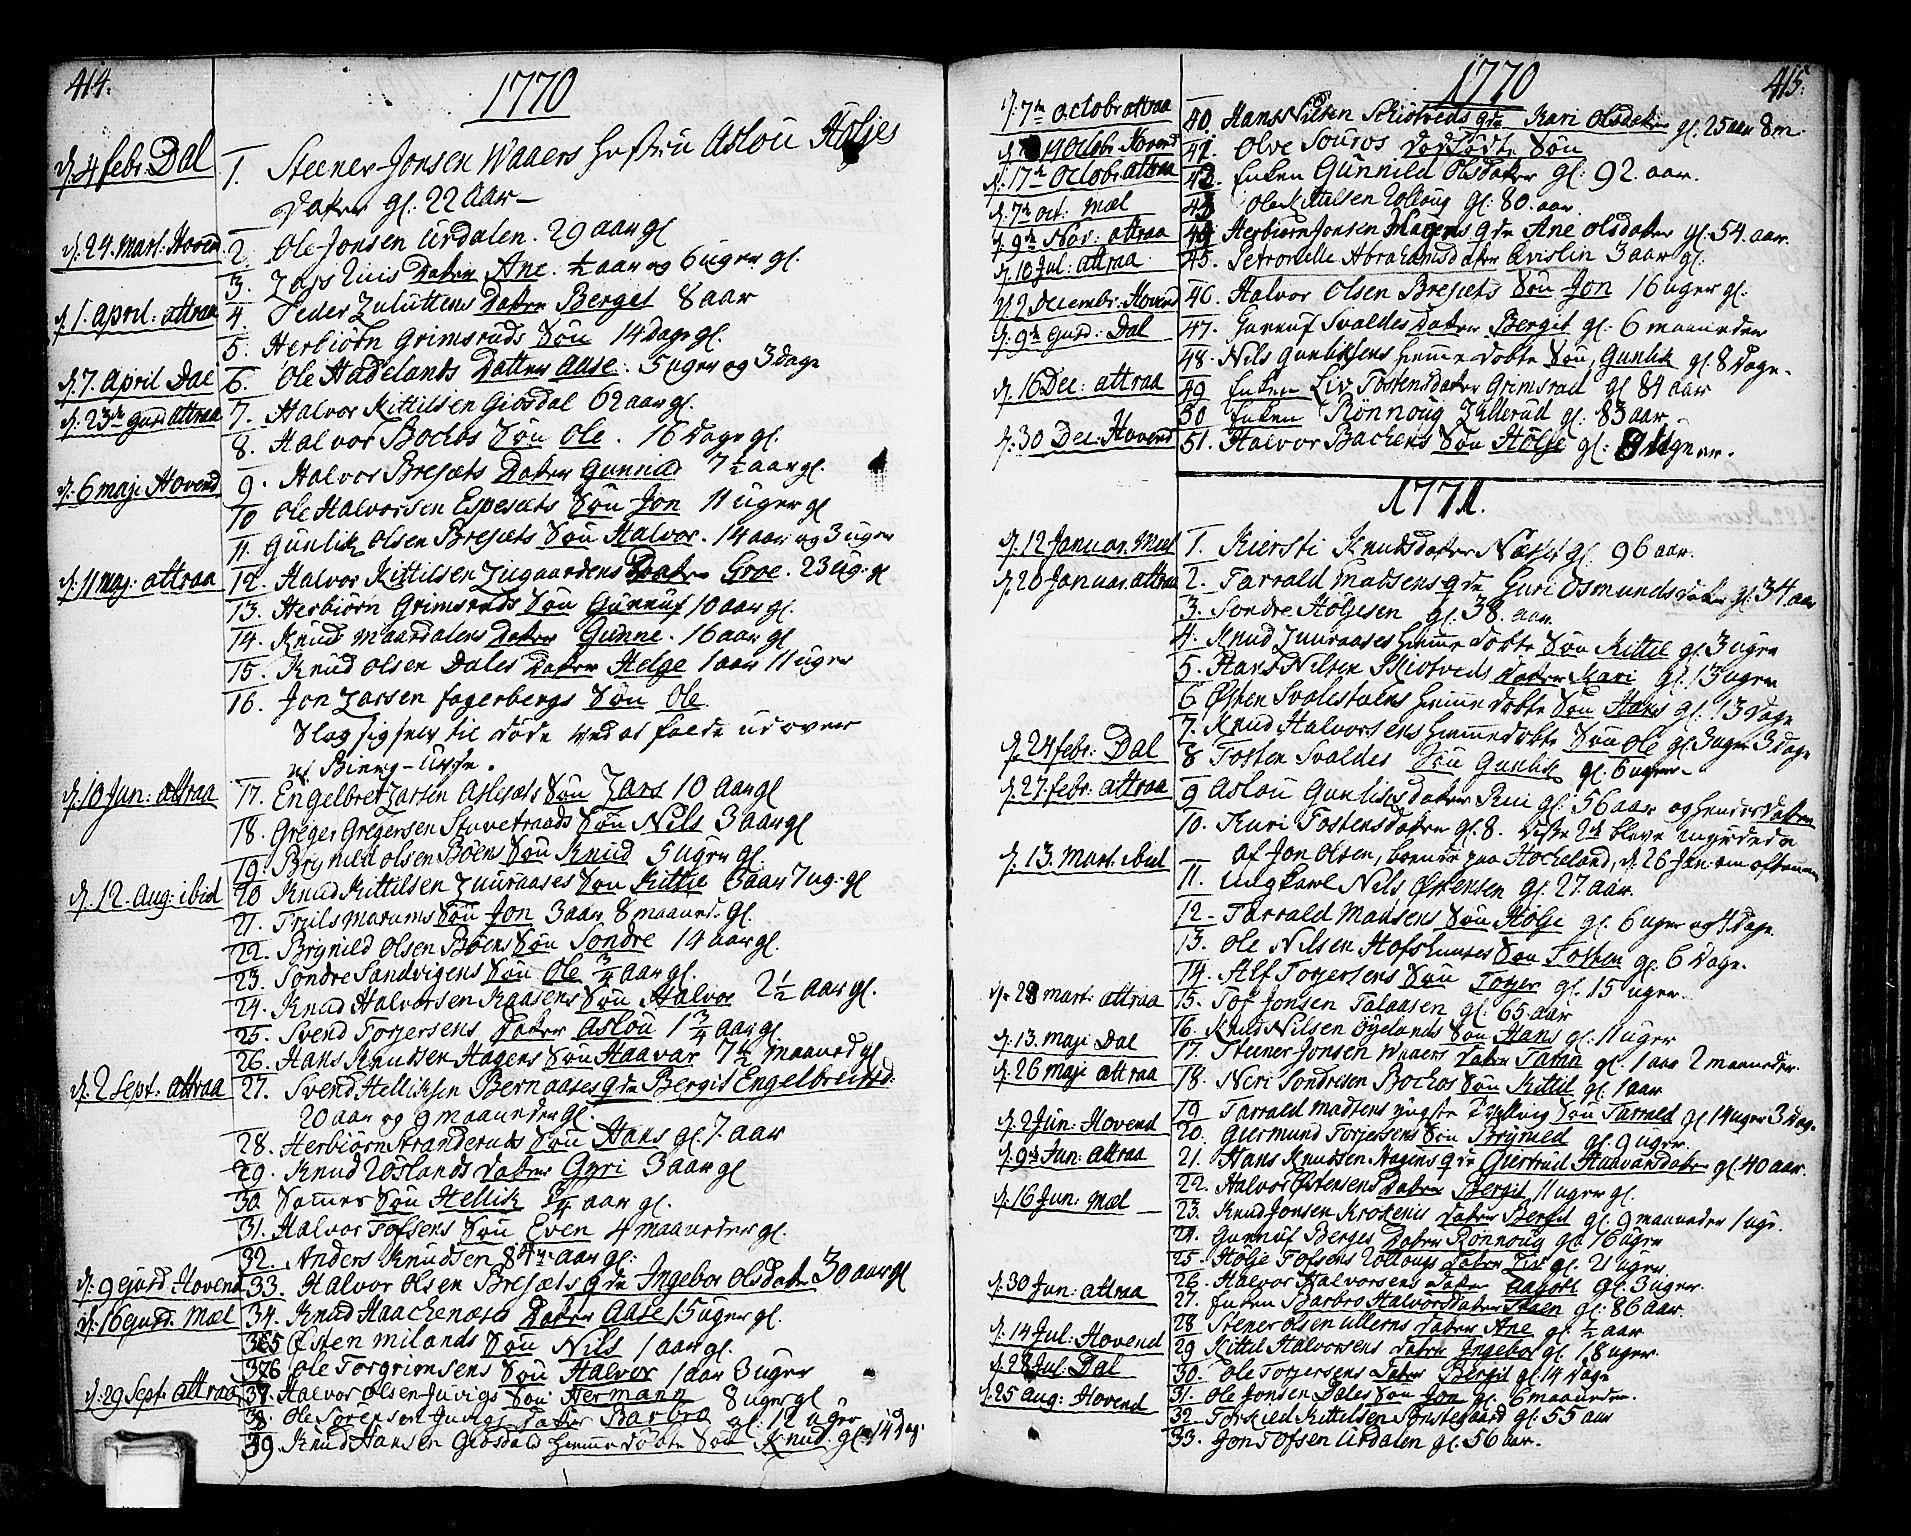 SAKO, Tinn kirkebøker, F/Fa/L0002: Ministerialbok nr. I 2, 1757-1810, s. 414-415